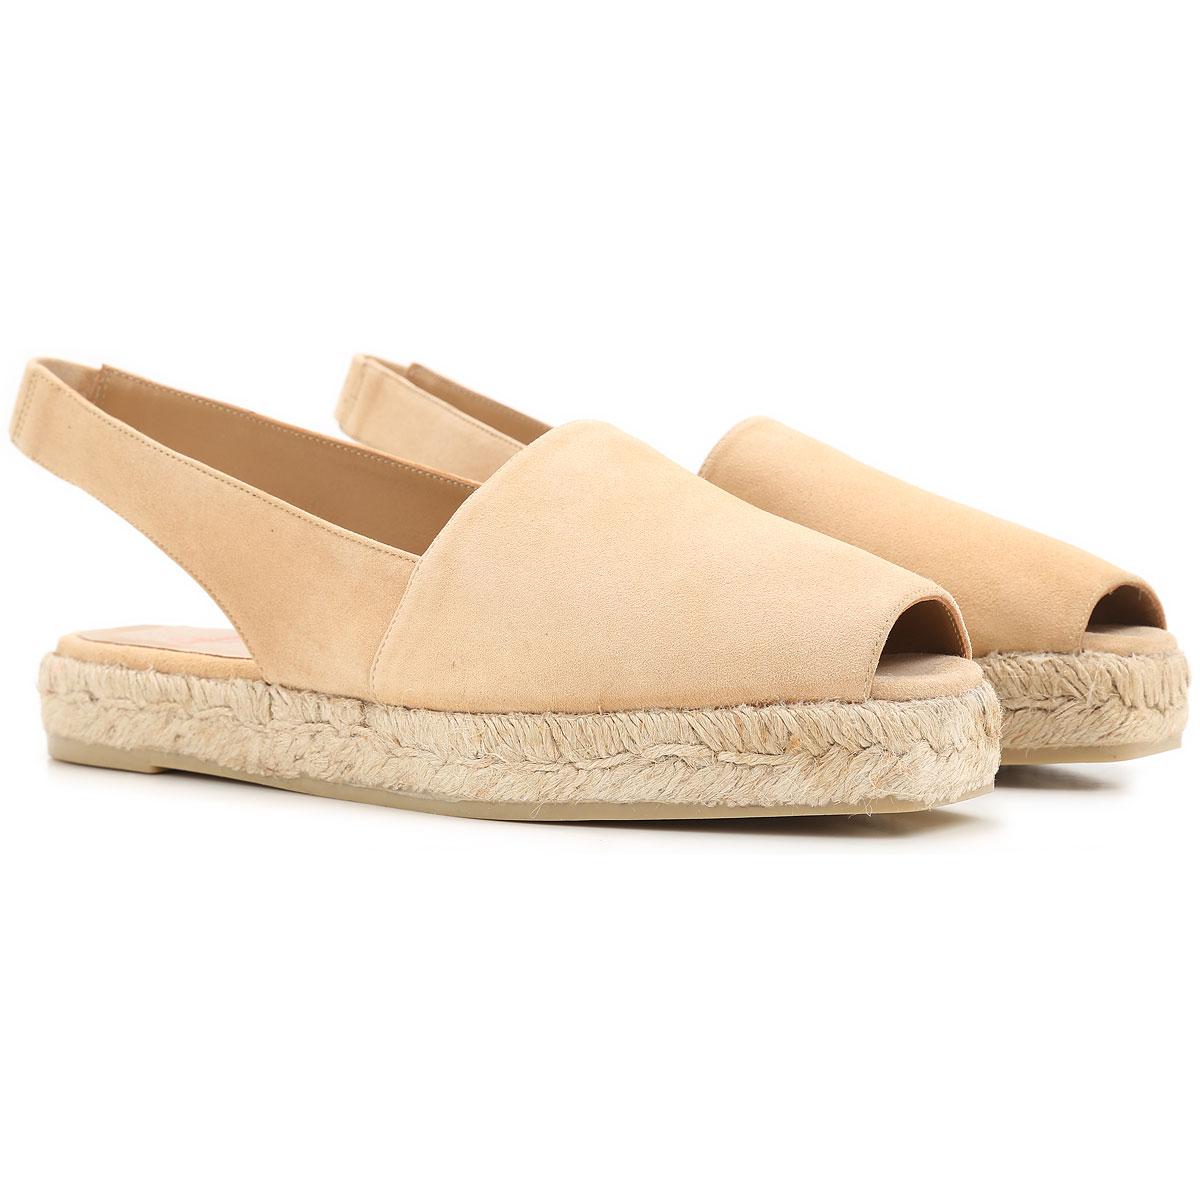 Castaner Slip on Sneakers for Women On Sale in Outlet, Beige, suede, 2017, 11 6 9